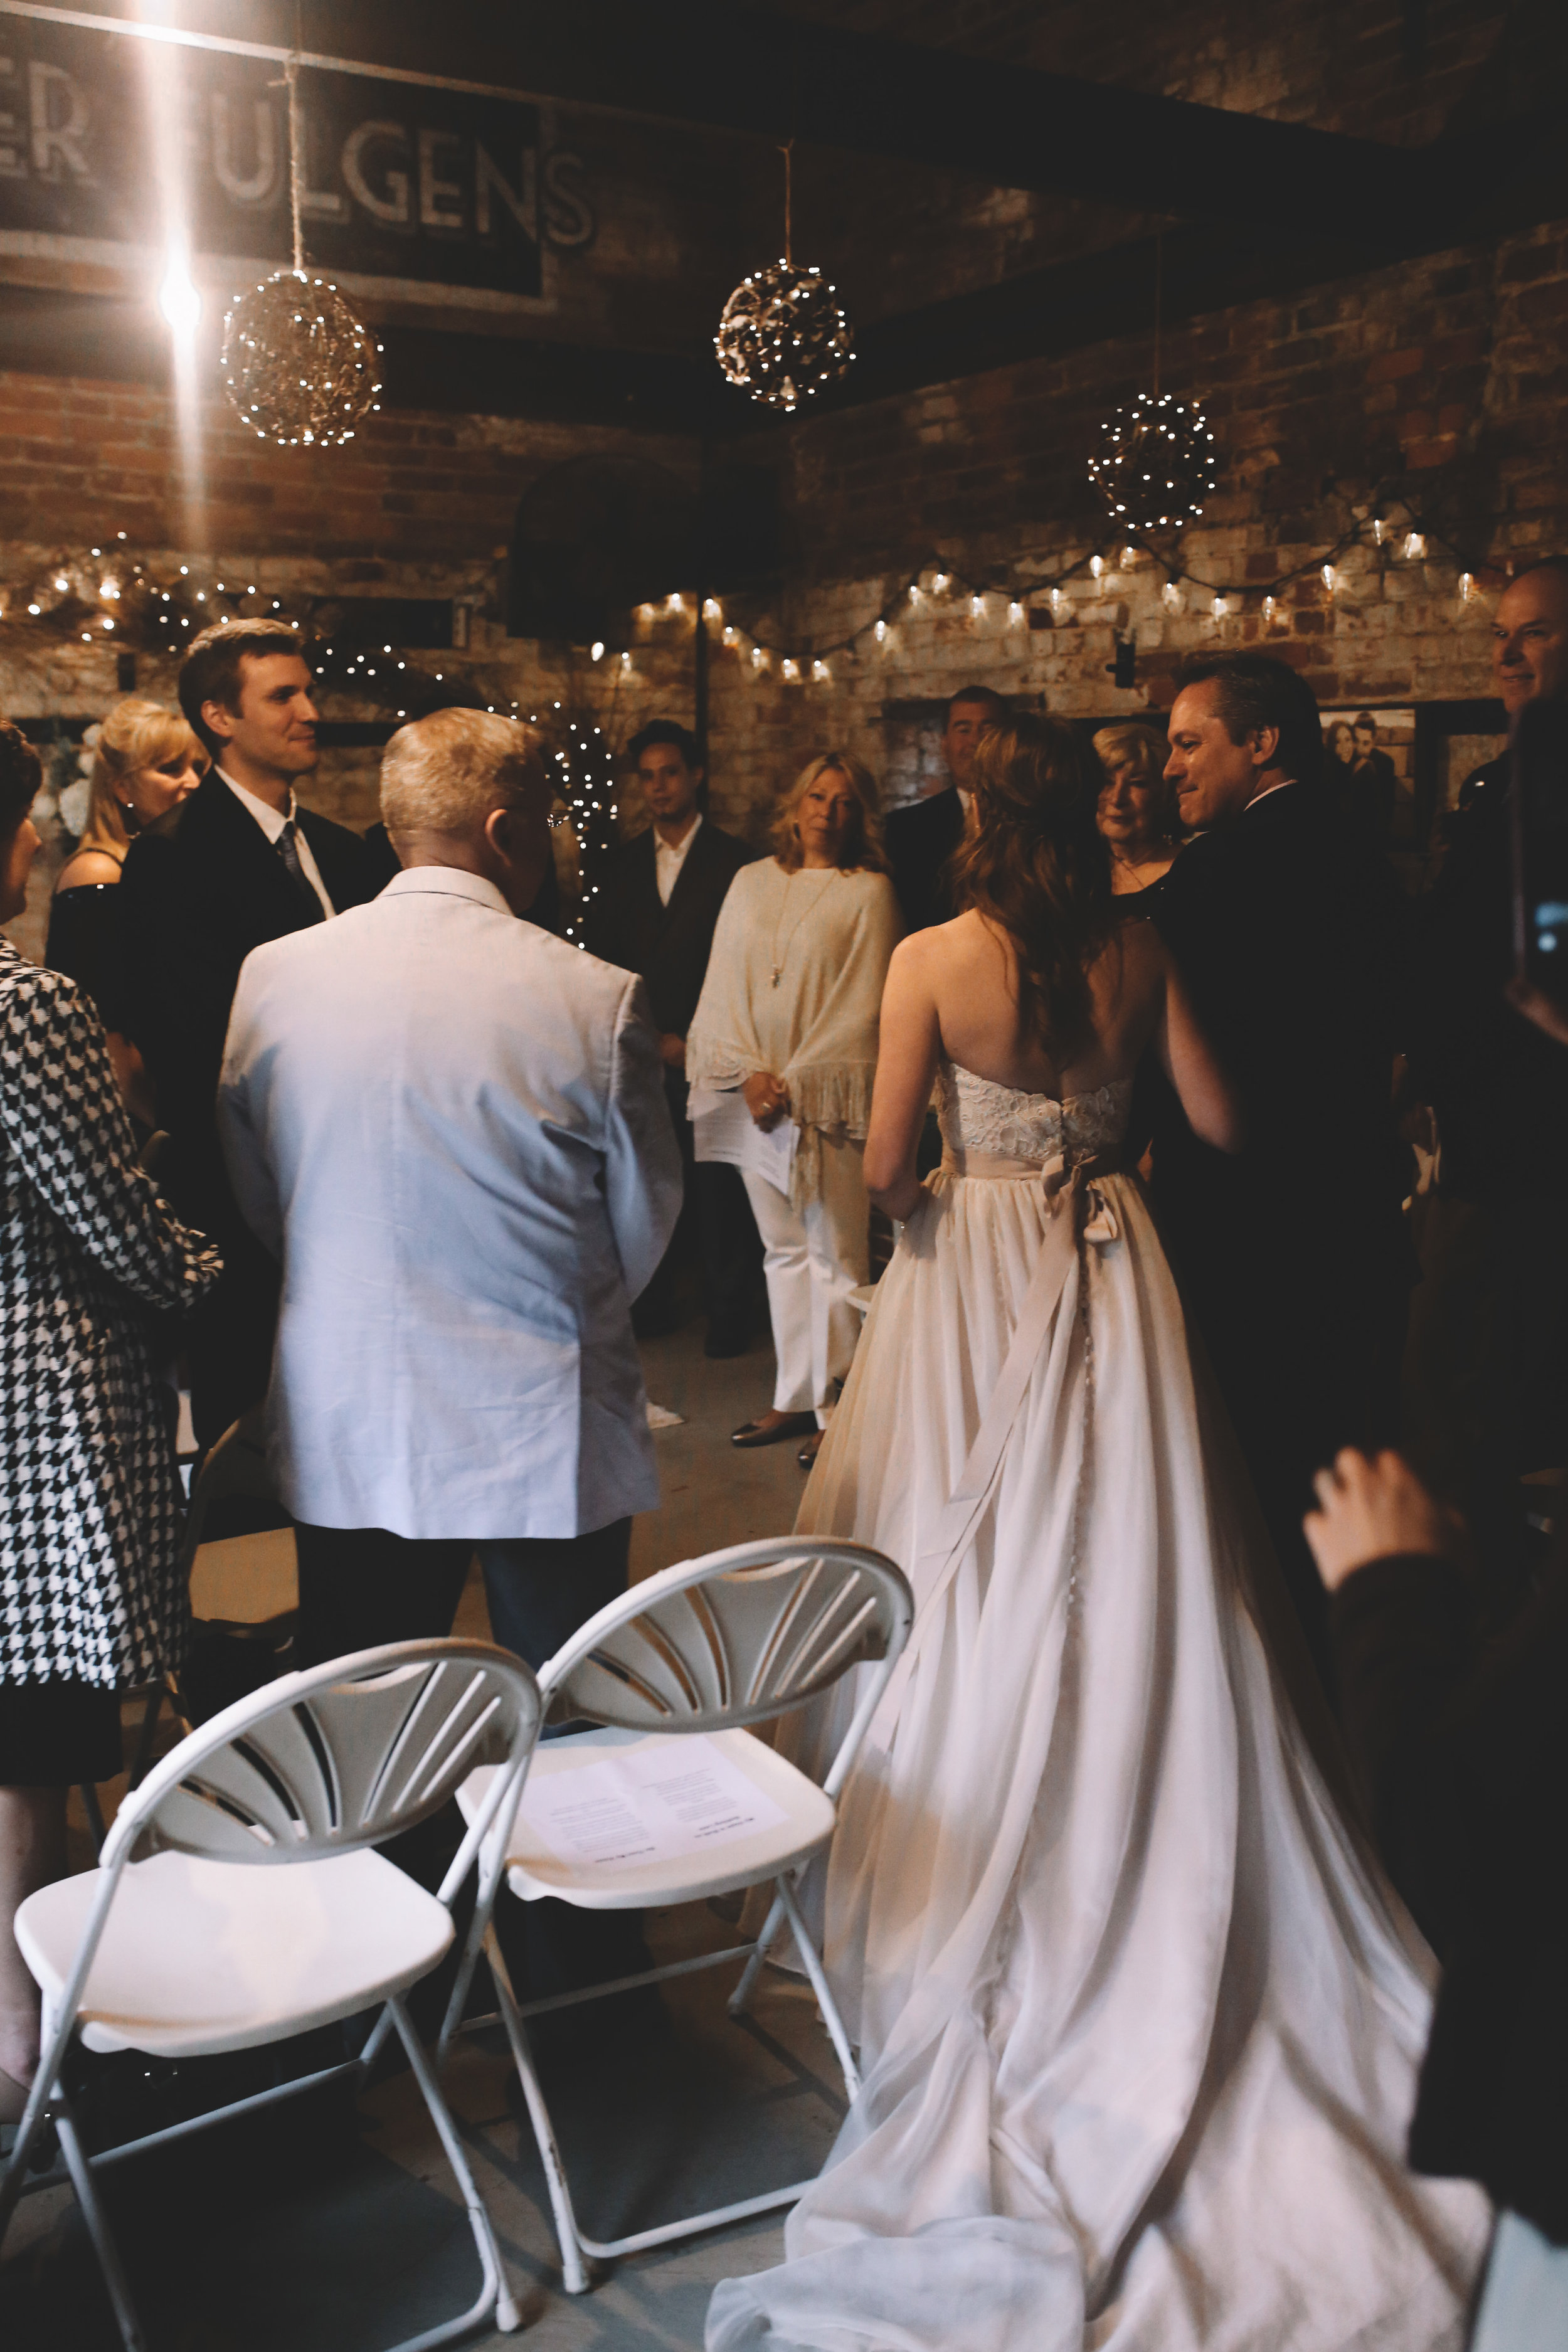 Jake + Brittney Balbas Airbnb Carriage House Wedding Evansville IN (233 of 426).jpg